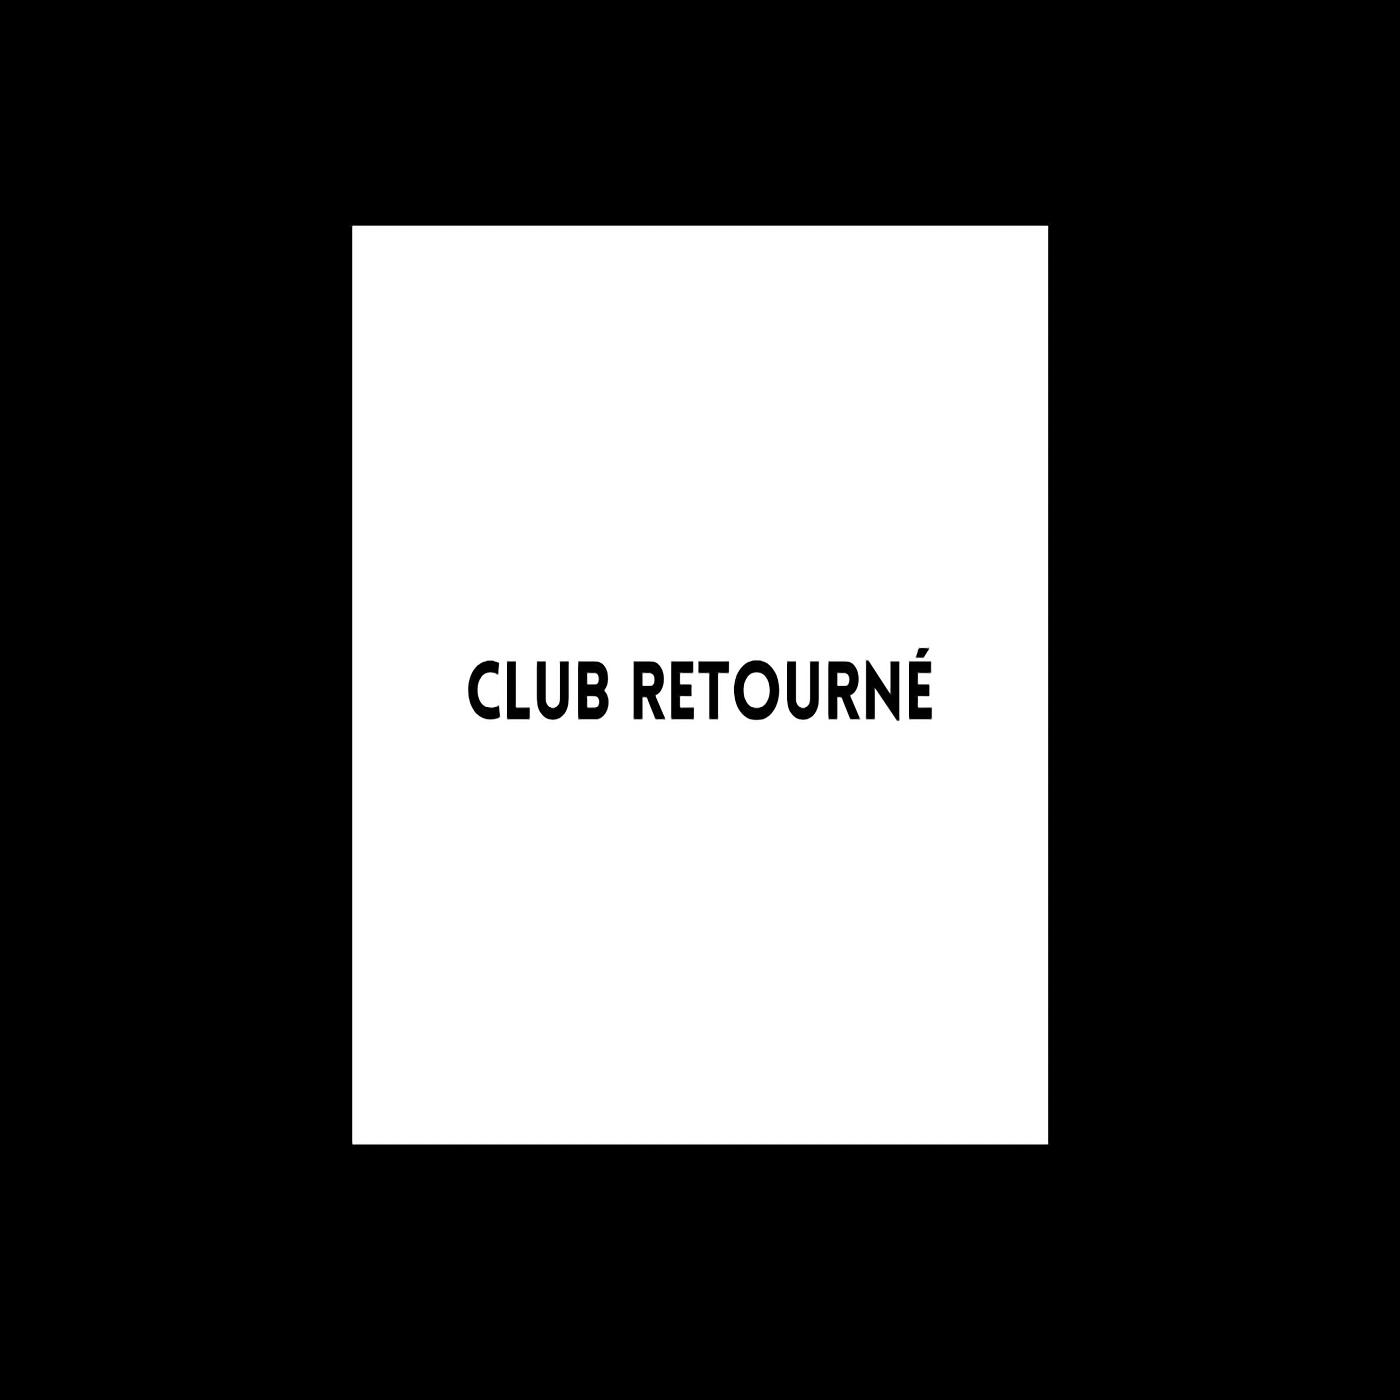 CLUB RETOURNÉ SEMAINE #50 - GAETAN NIKOLIC